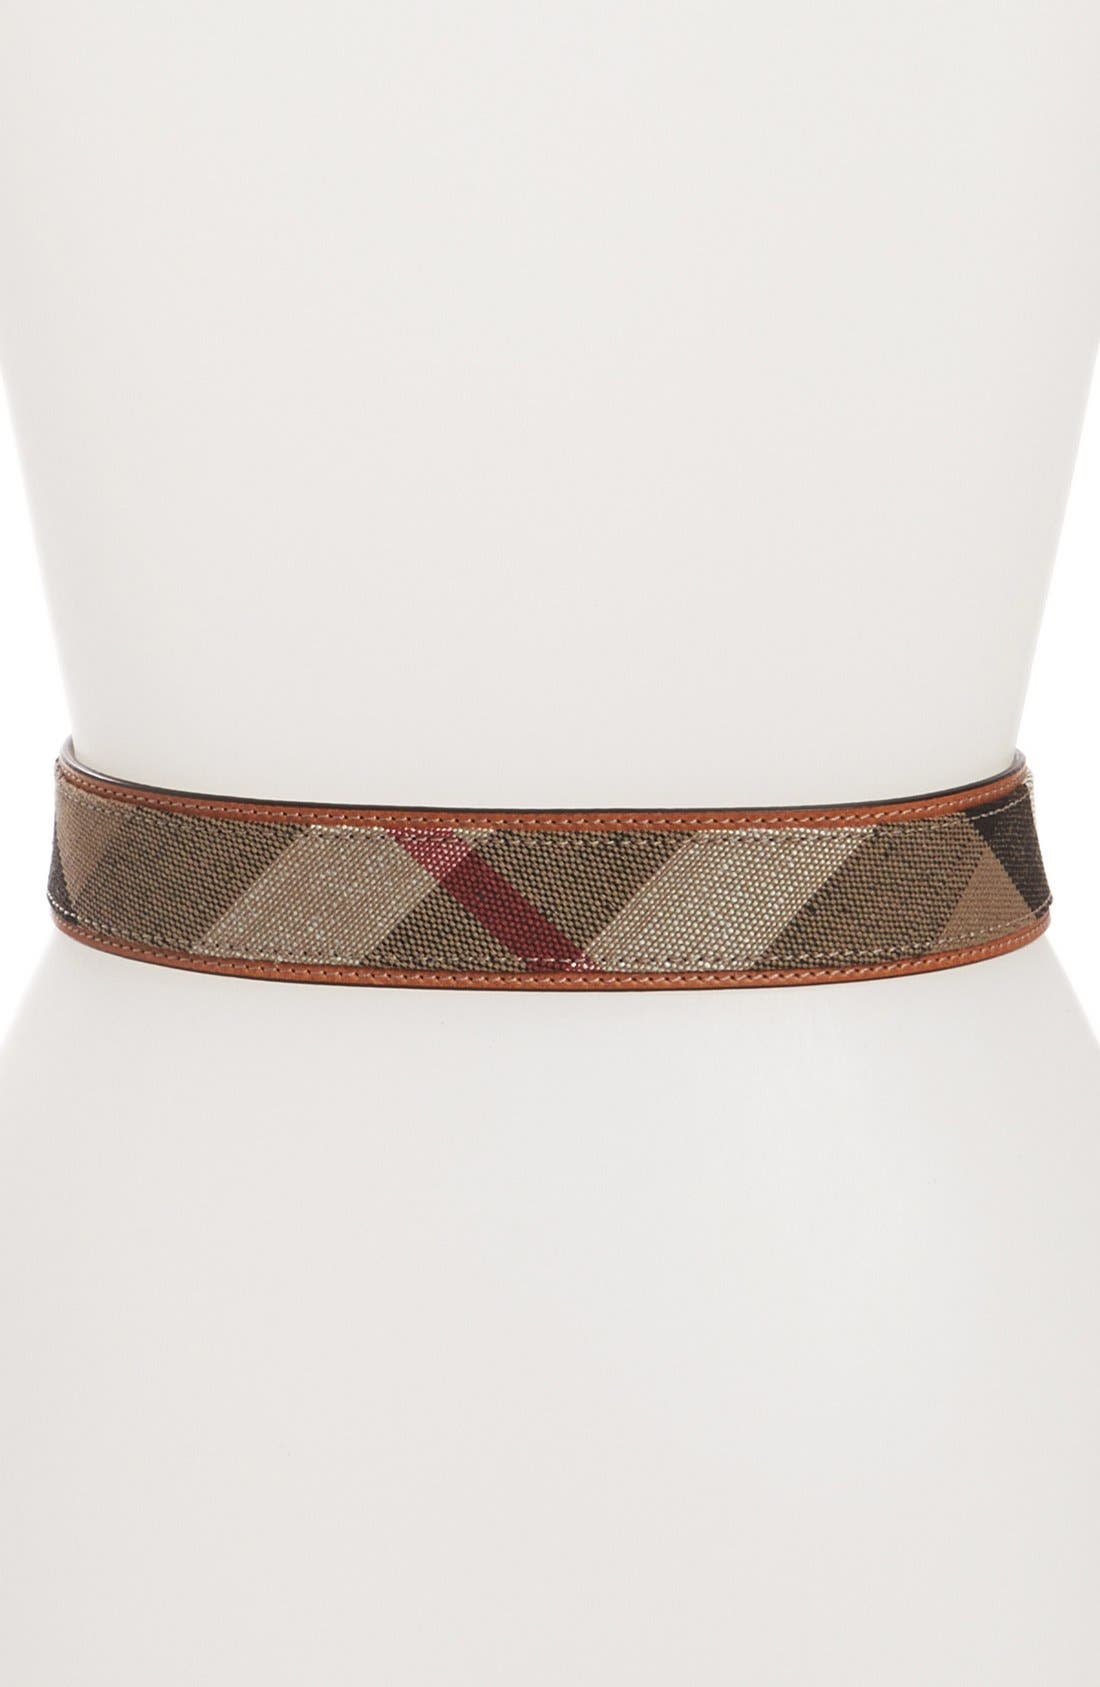 Alternate Image 2  - Burberry Check Leather Trim Belt